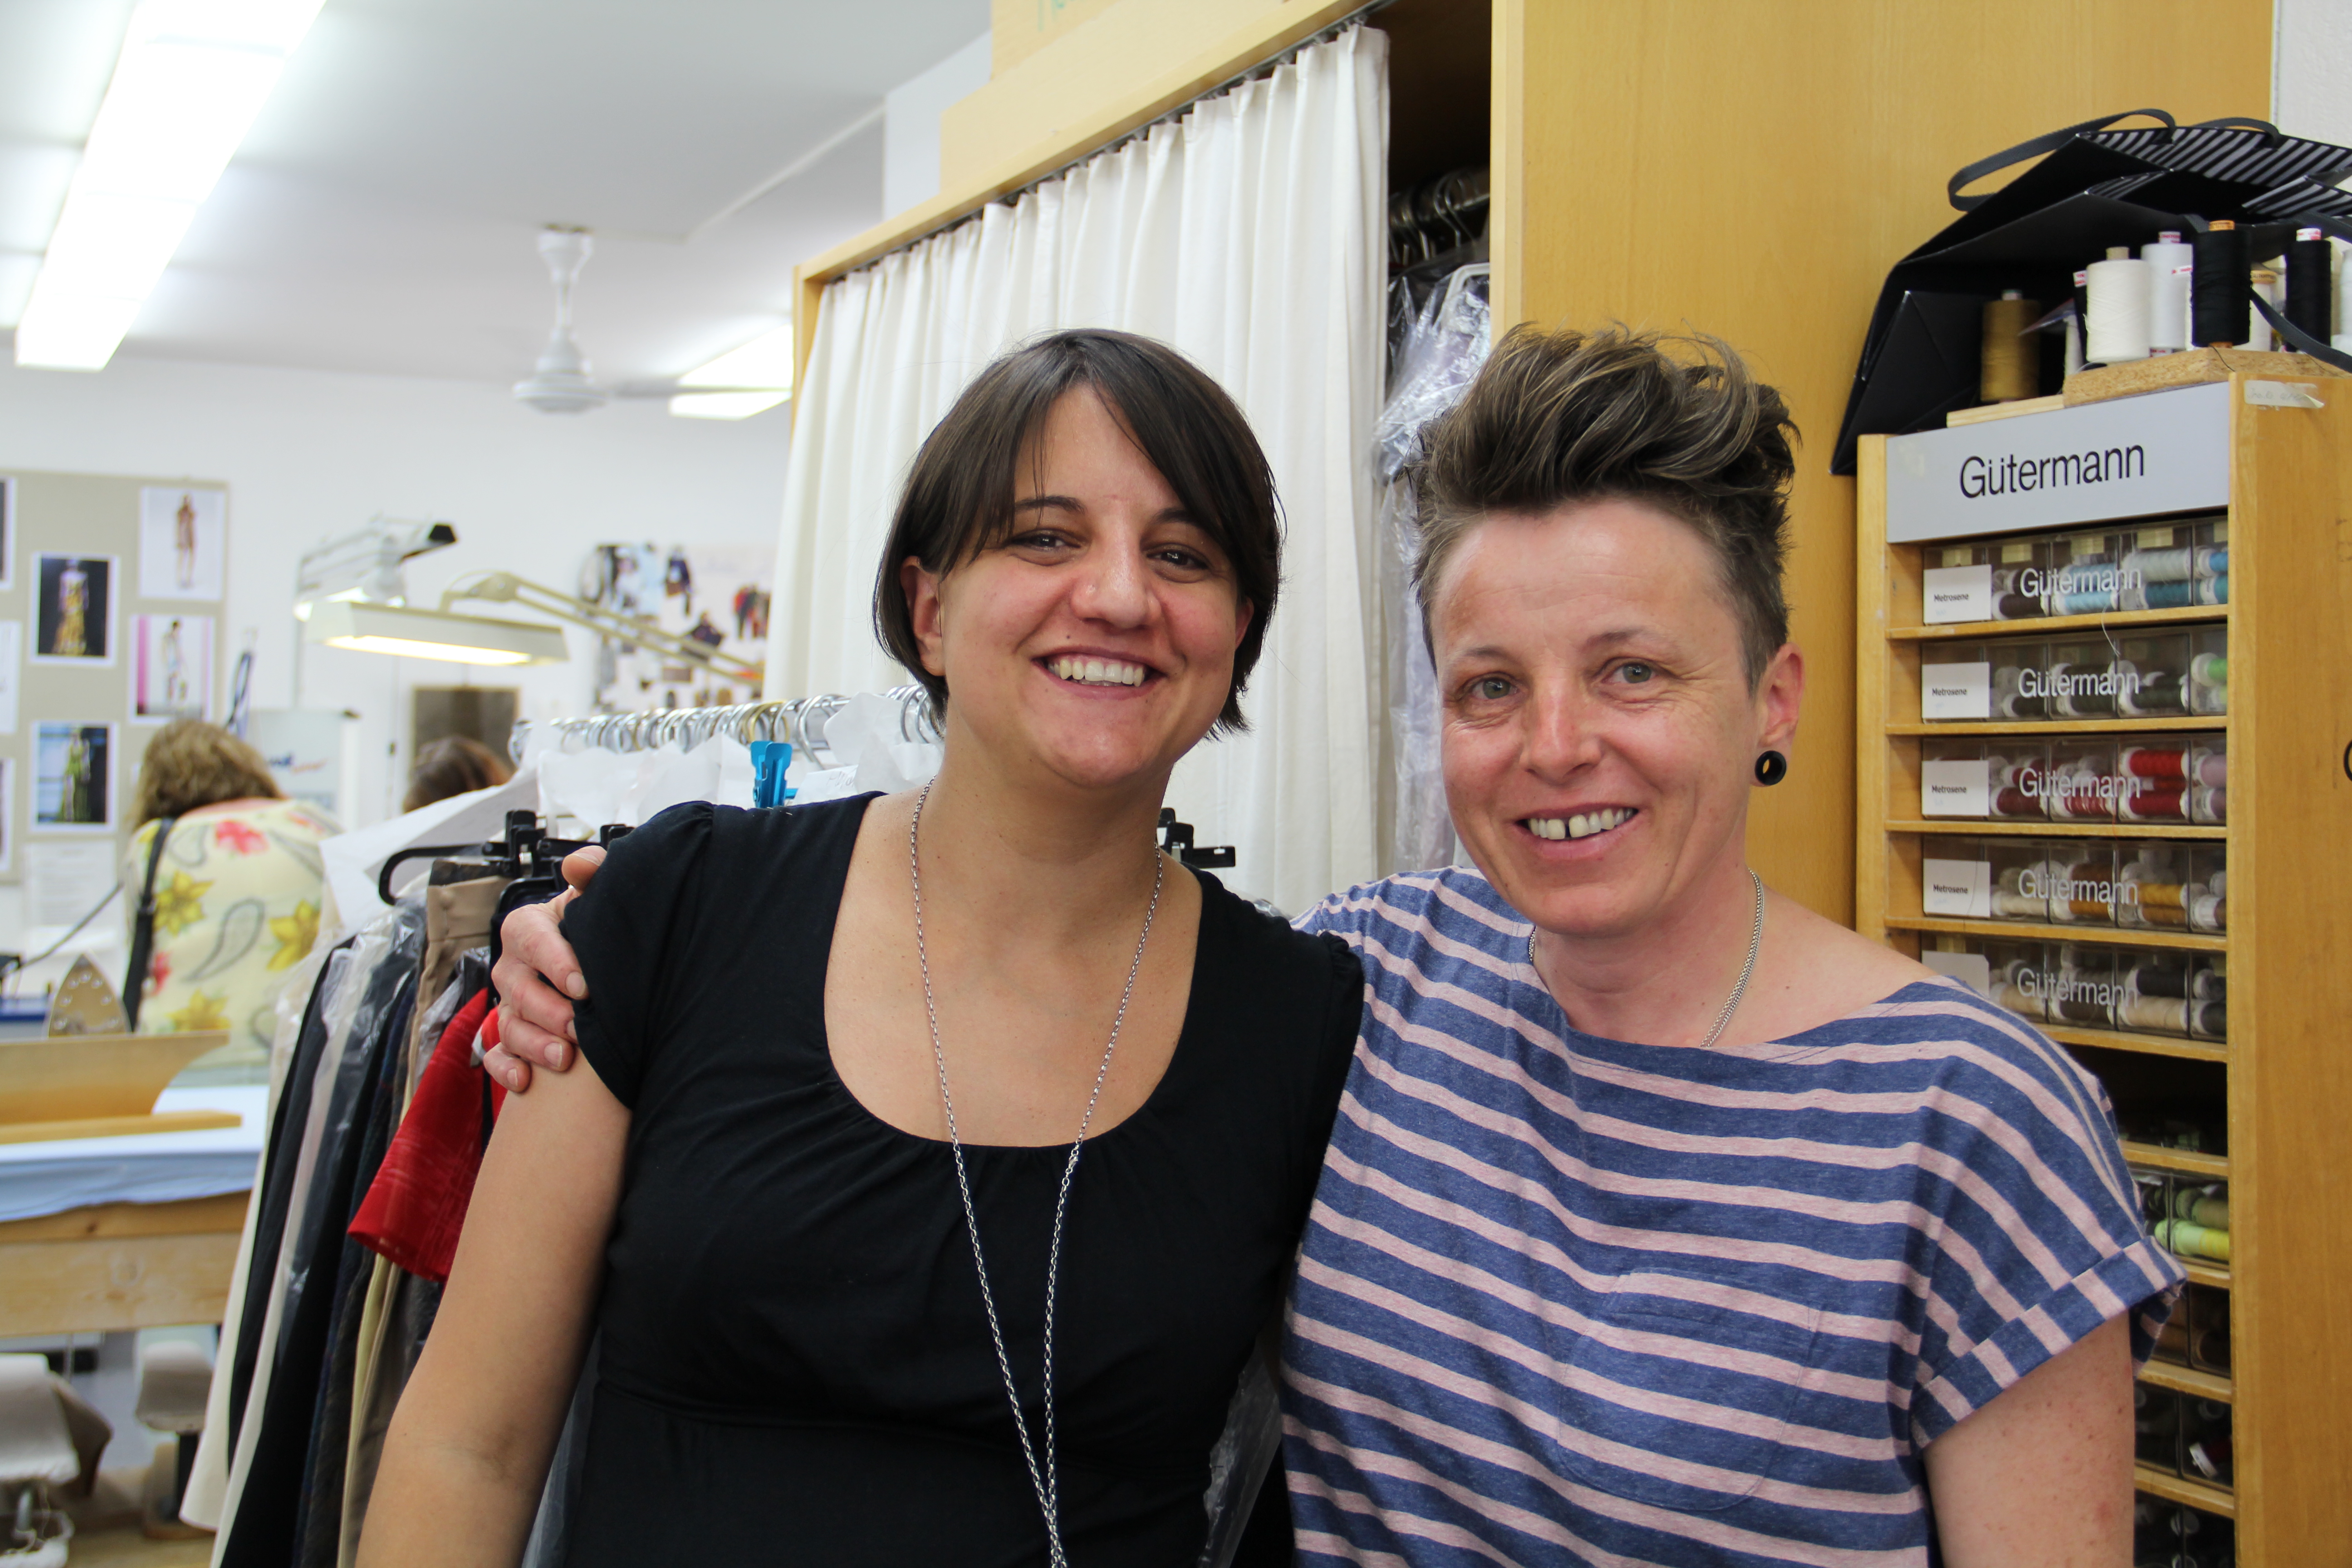 Irena Blumenthal, la menadra da l'atelier e Jacqueline Cavegn dil Laki mi.